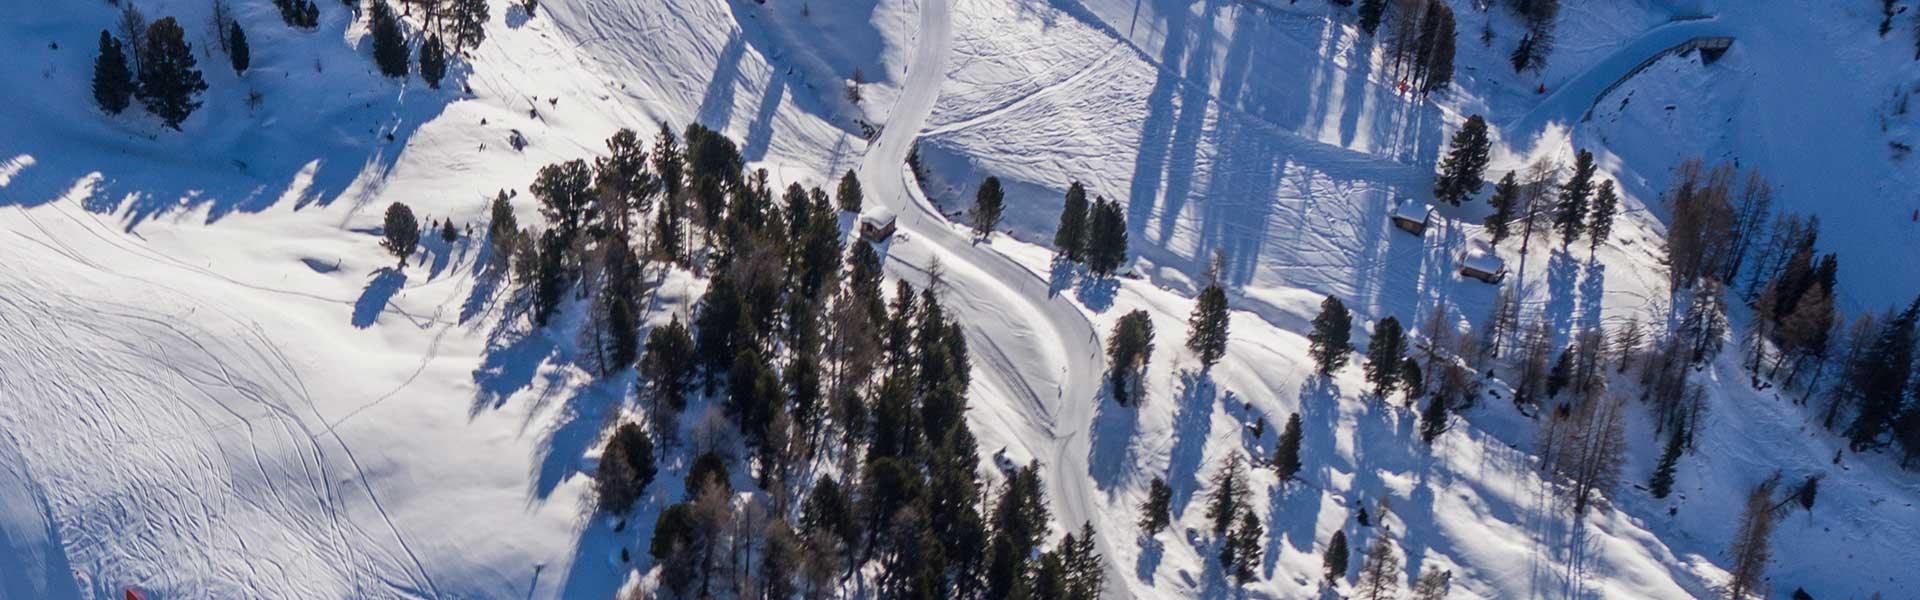 Ski Strecke